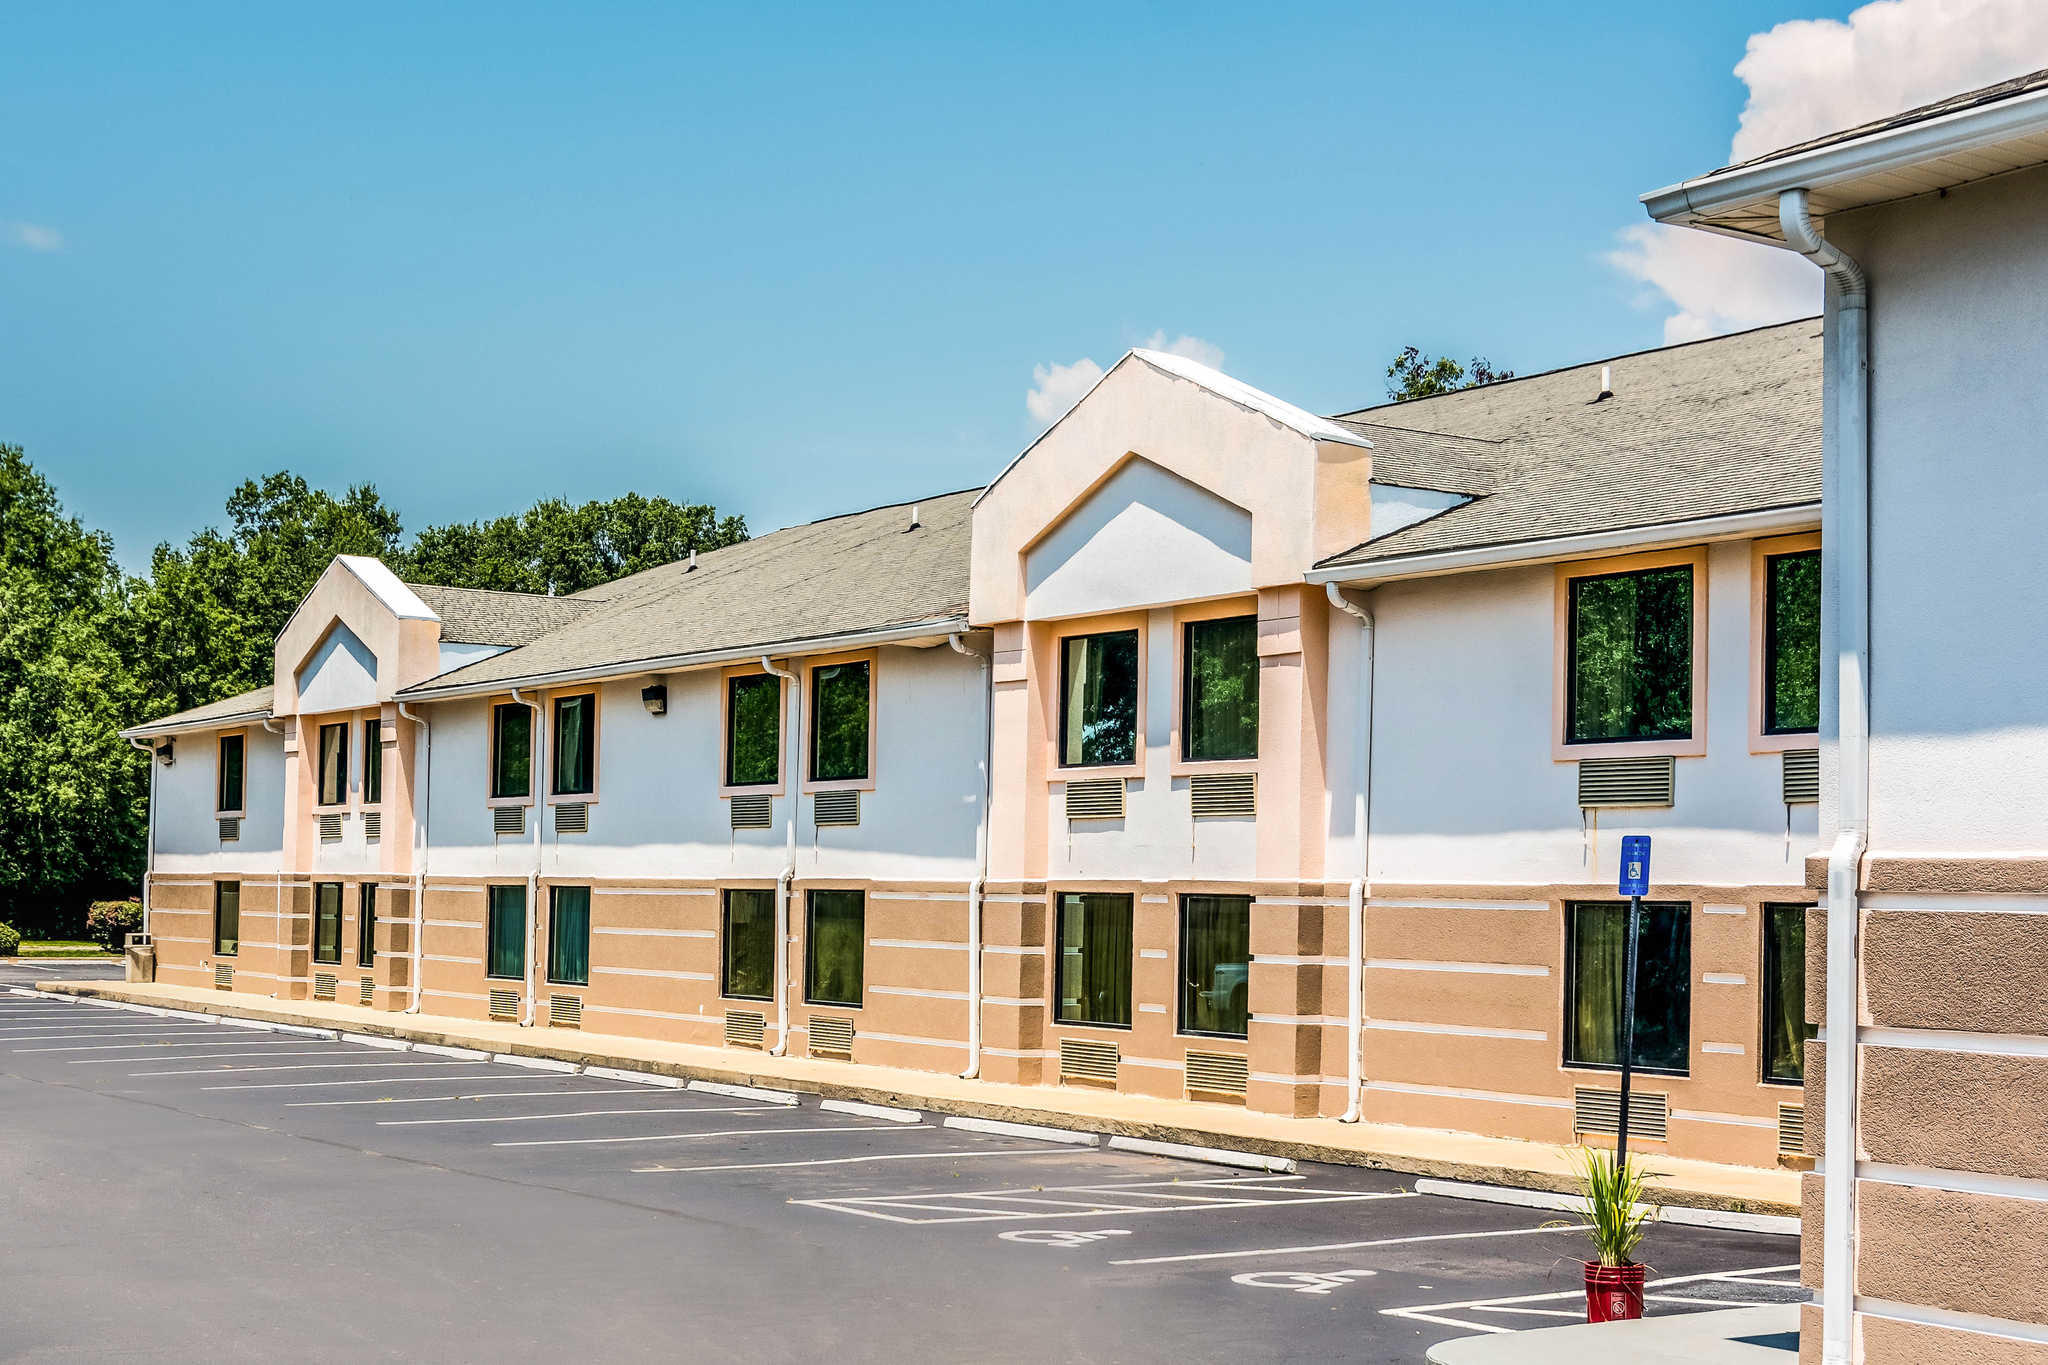 Hotels Near Sandersville Ga